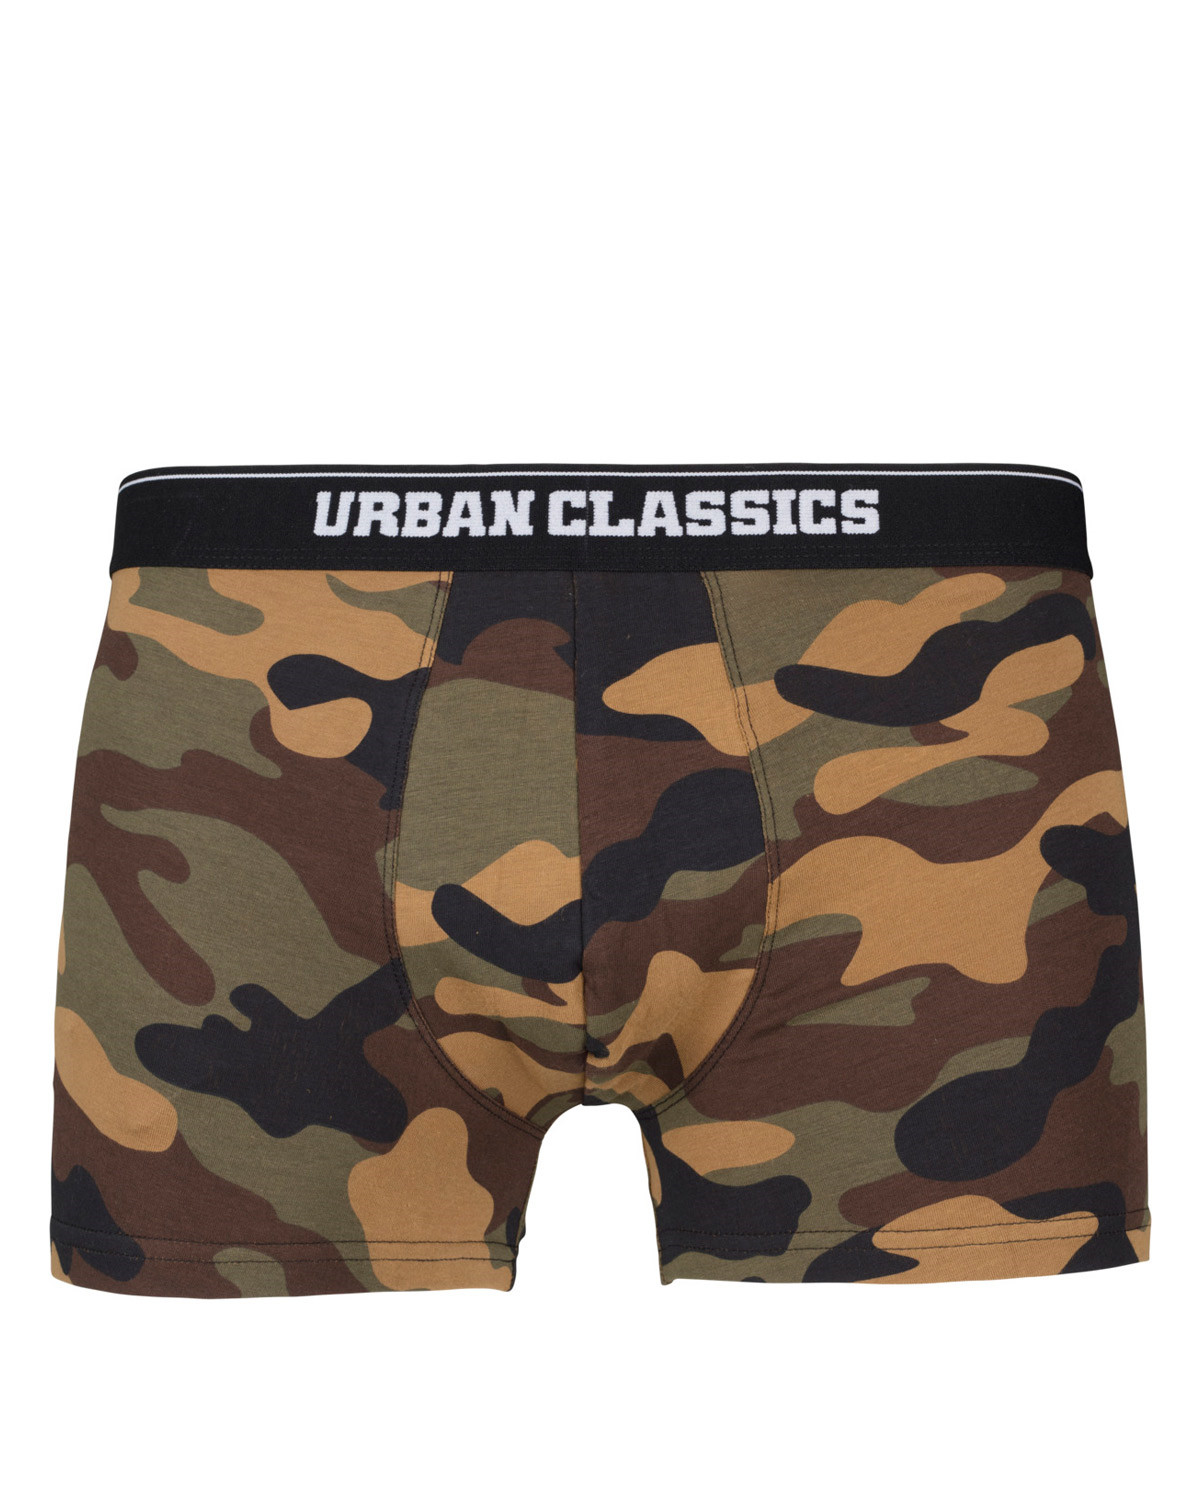 Image of   Urban Classics Camouflage Boxer Shorts - 2-Pak (Woodland / Dark camo, 2XL)